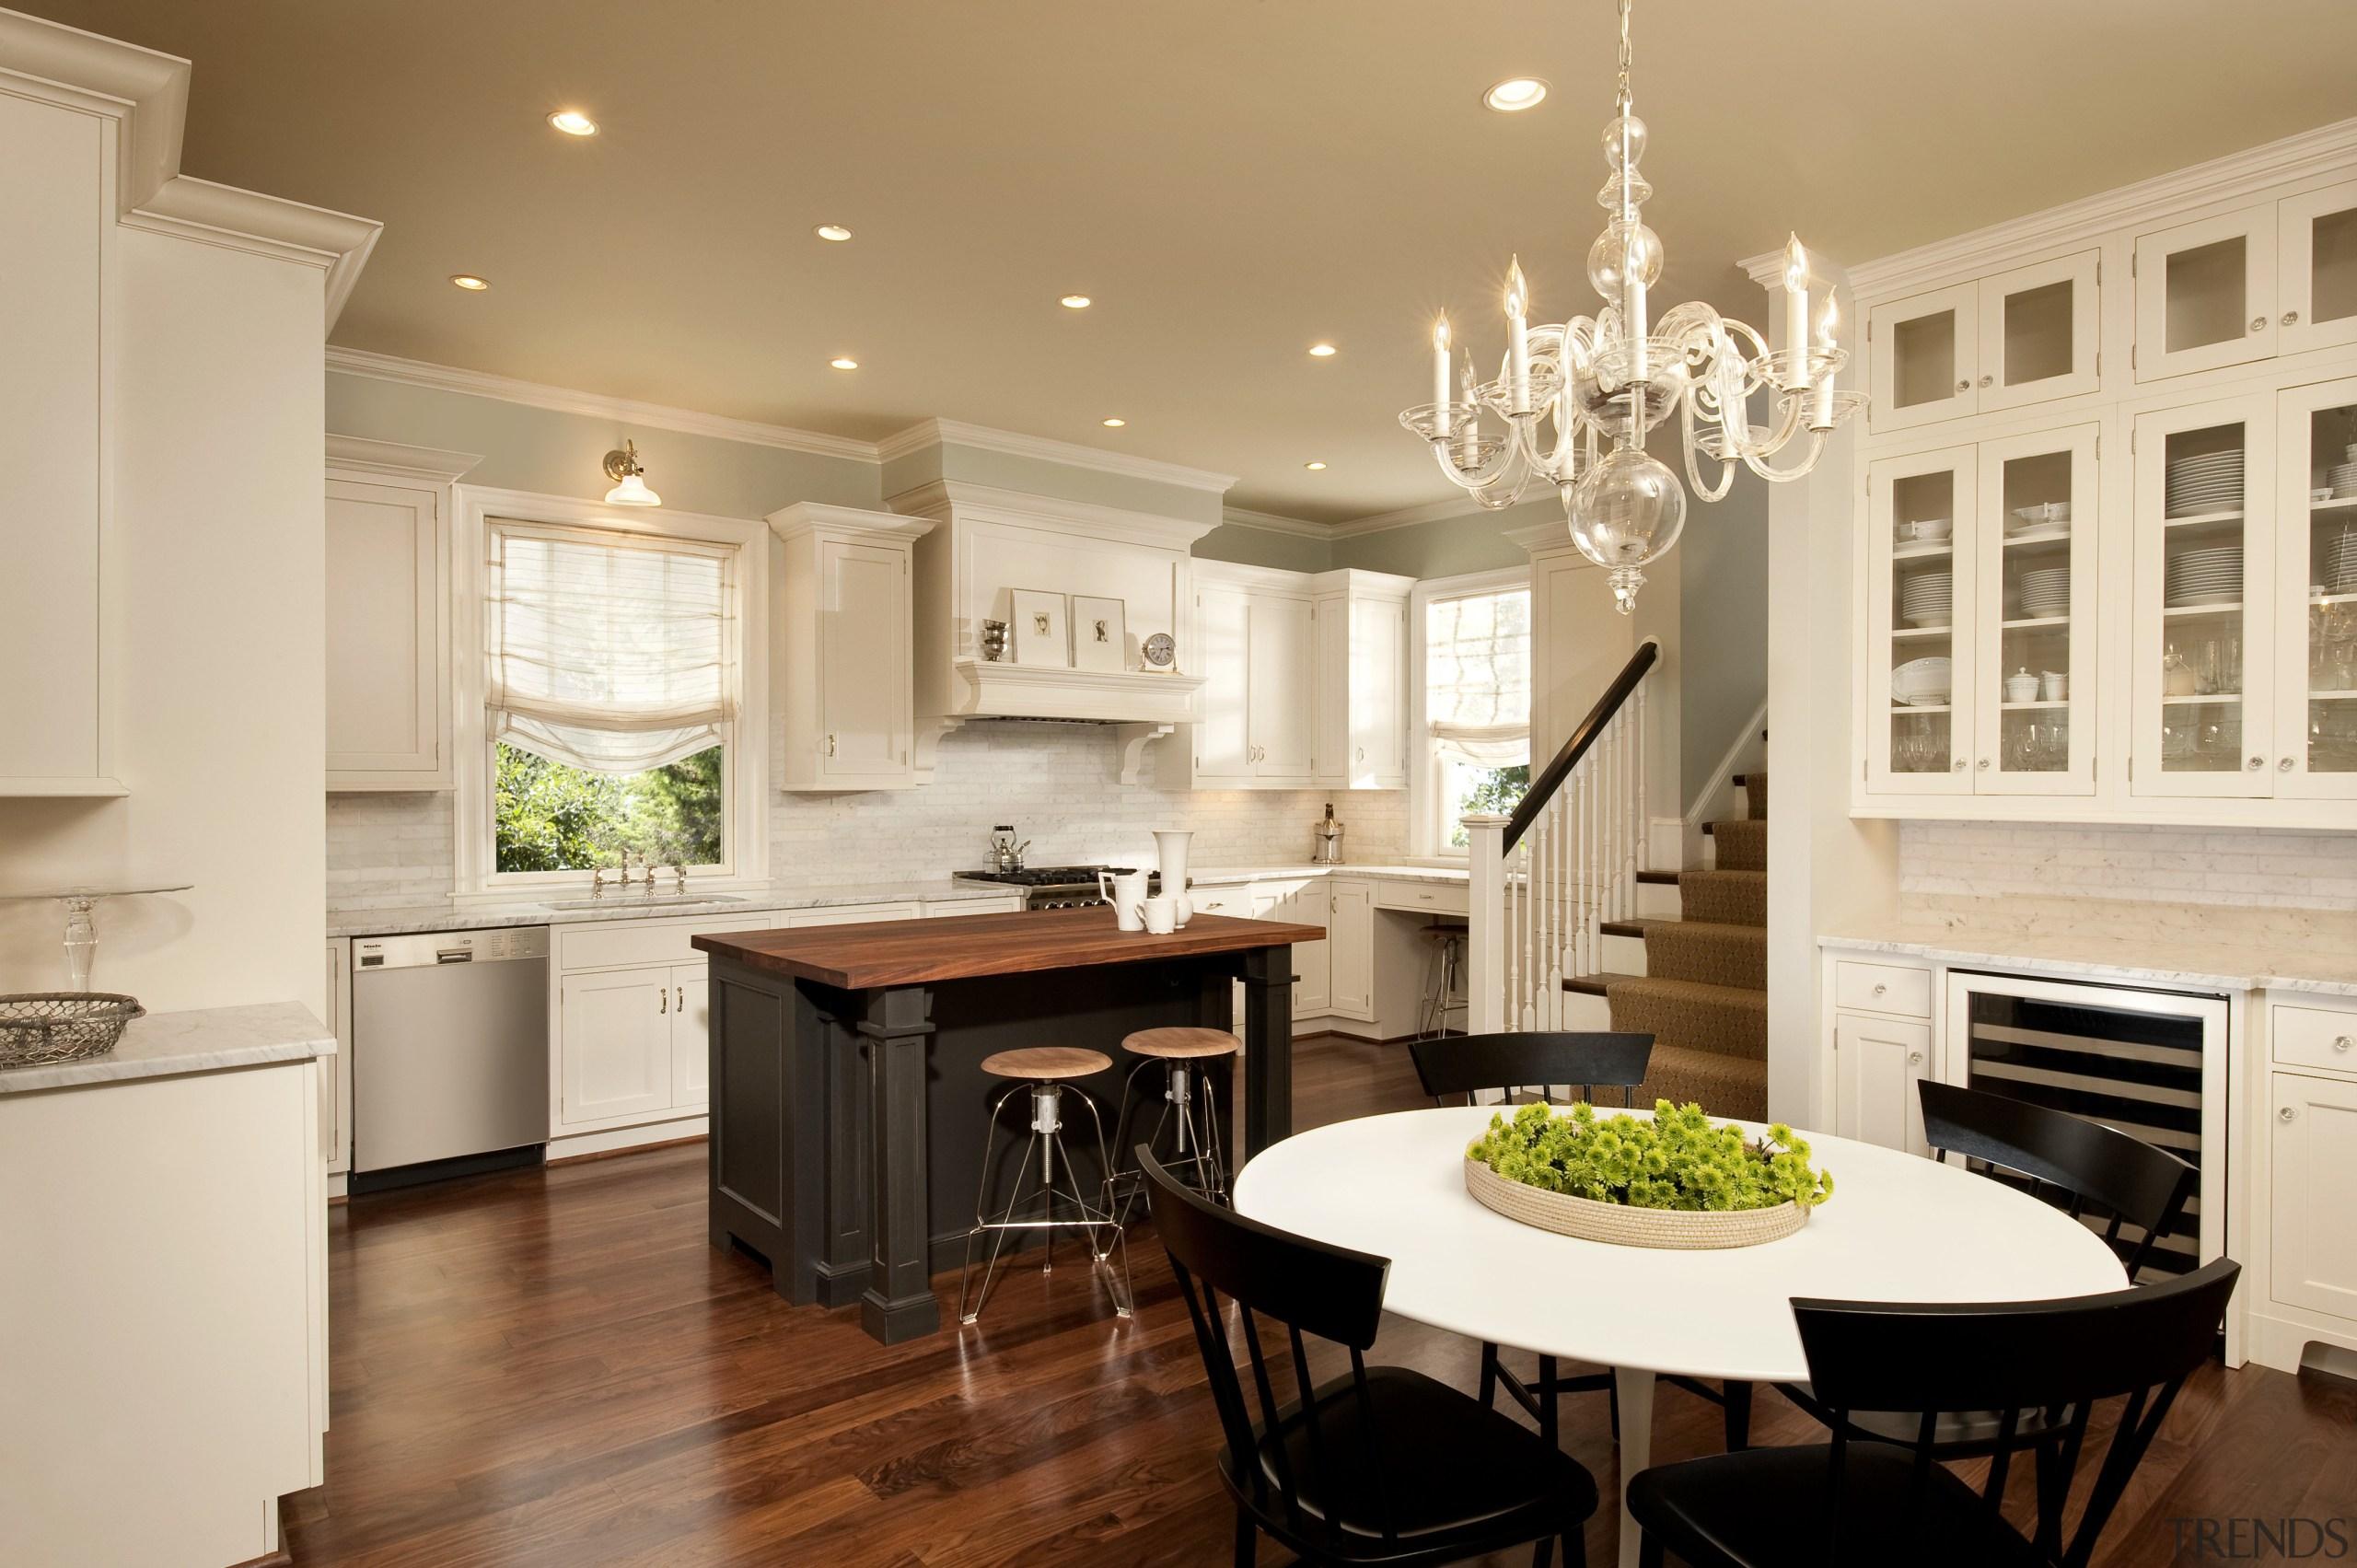 View of kitchen designed by Nadia Subaran. Designed cabinetry, ceiling, countertop, cuisine classique, home, interior design, kitchen, room, orange